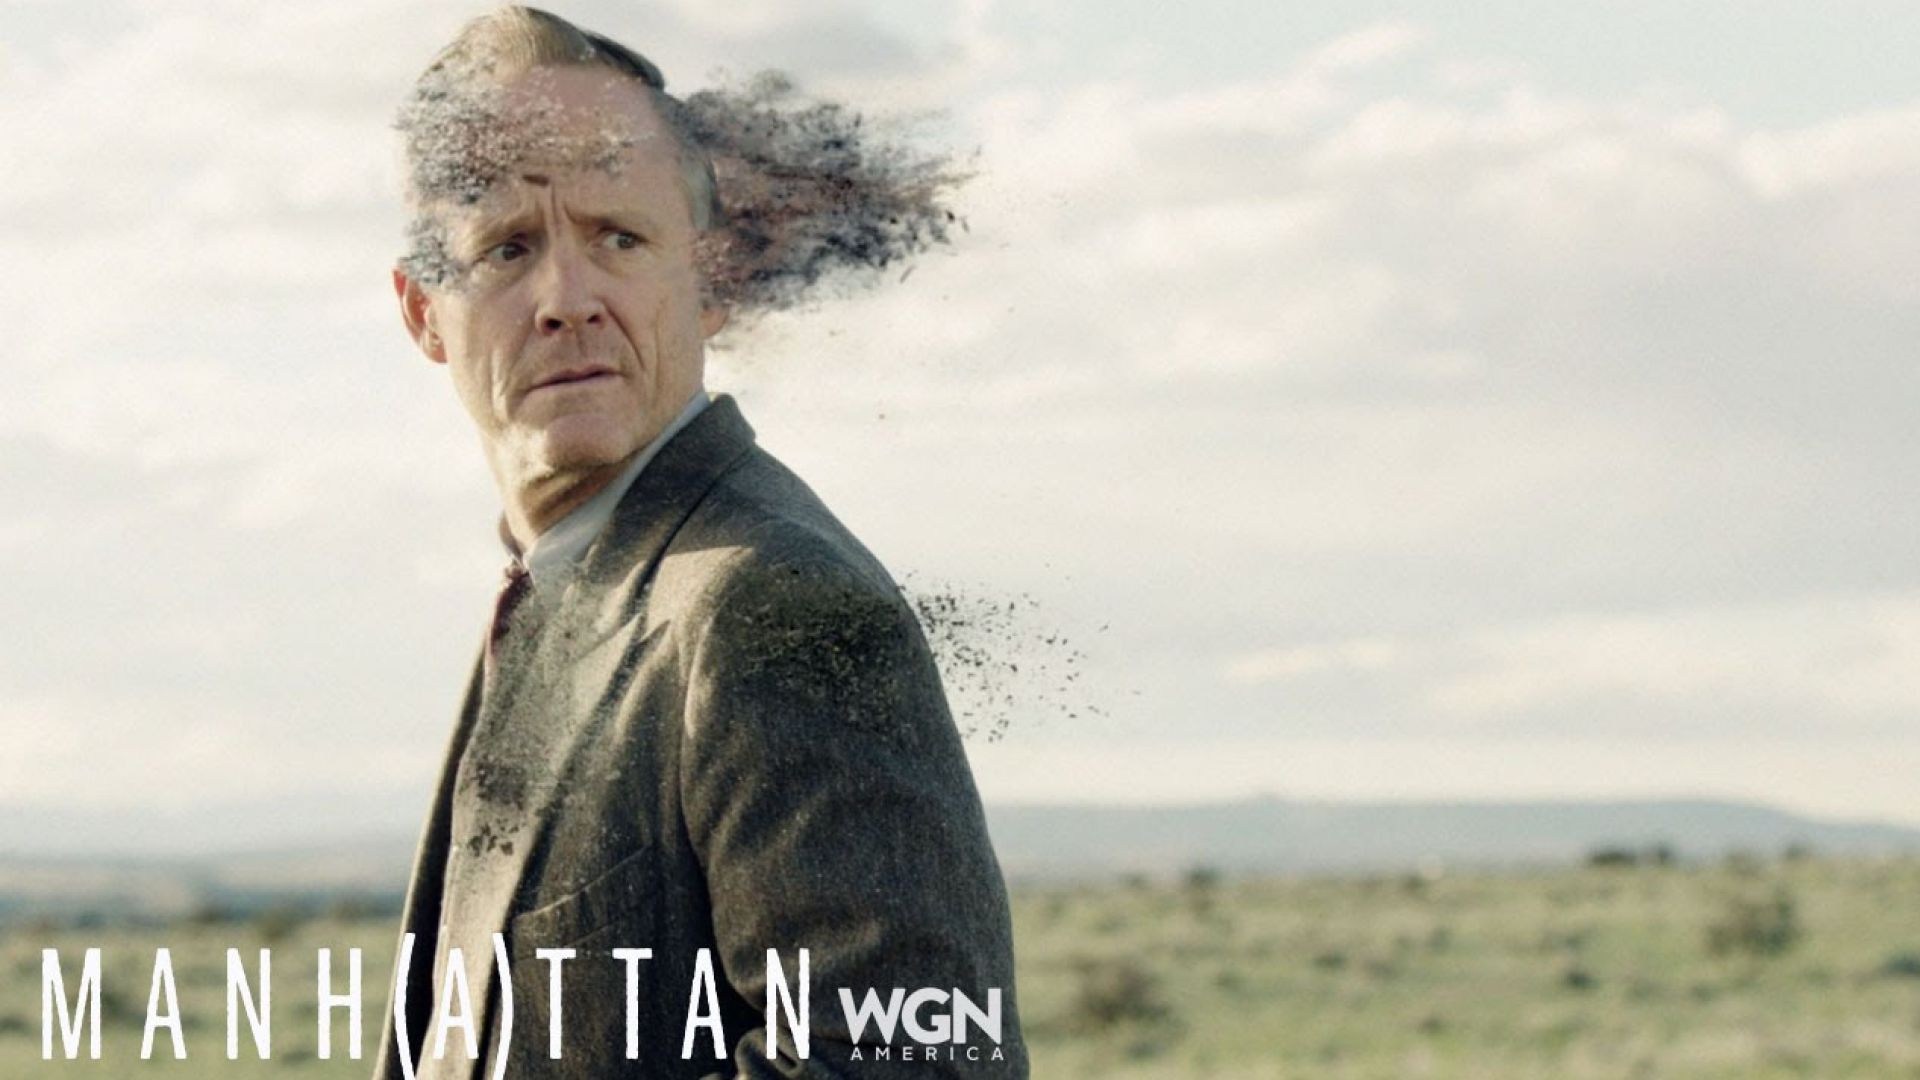 Fancy CG trailer for Manhattan Season 2 teases more Secrets